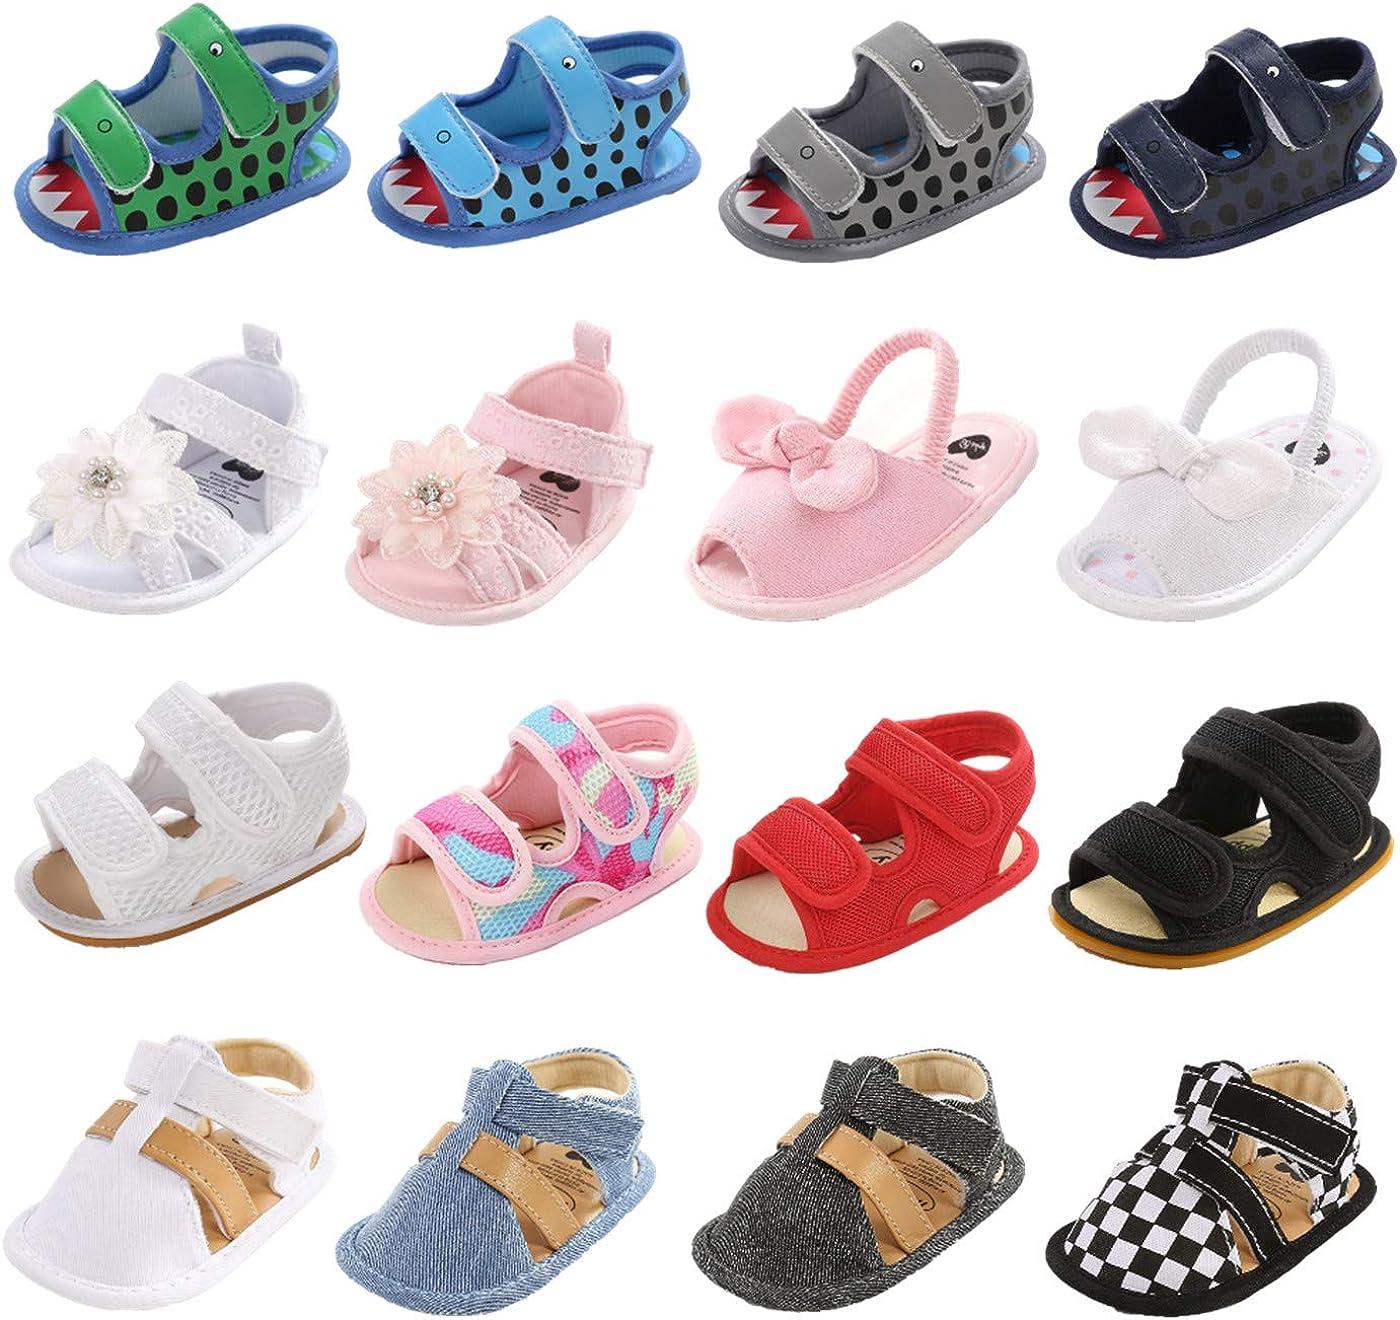 Unisex Baby Boys Girls Summer Sandal Premium R Soft Ranking TOP4 Weekly update Infant Flats